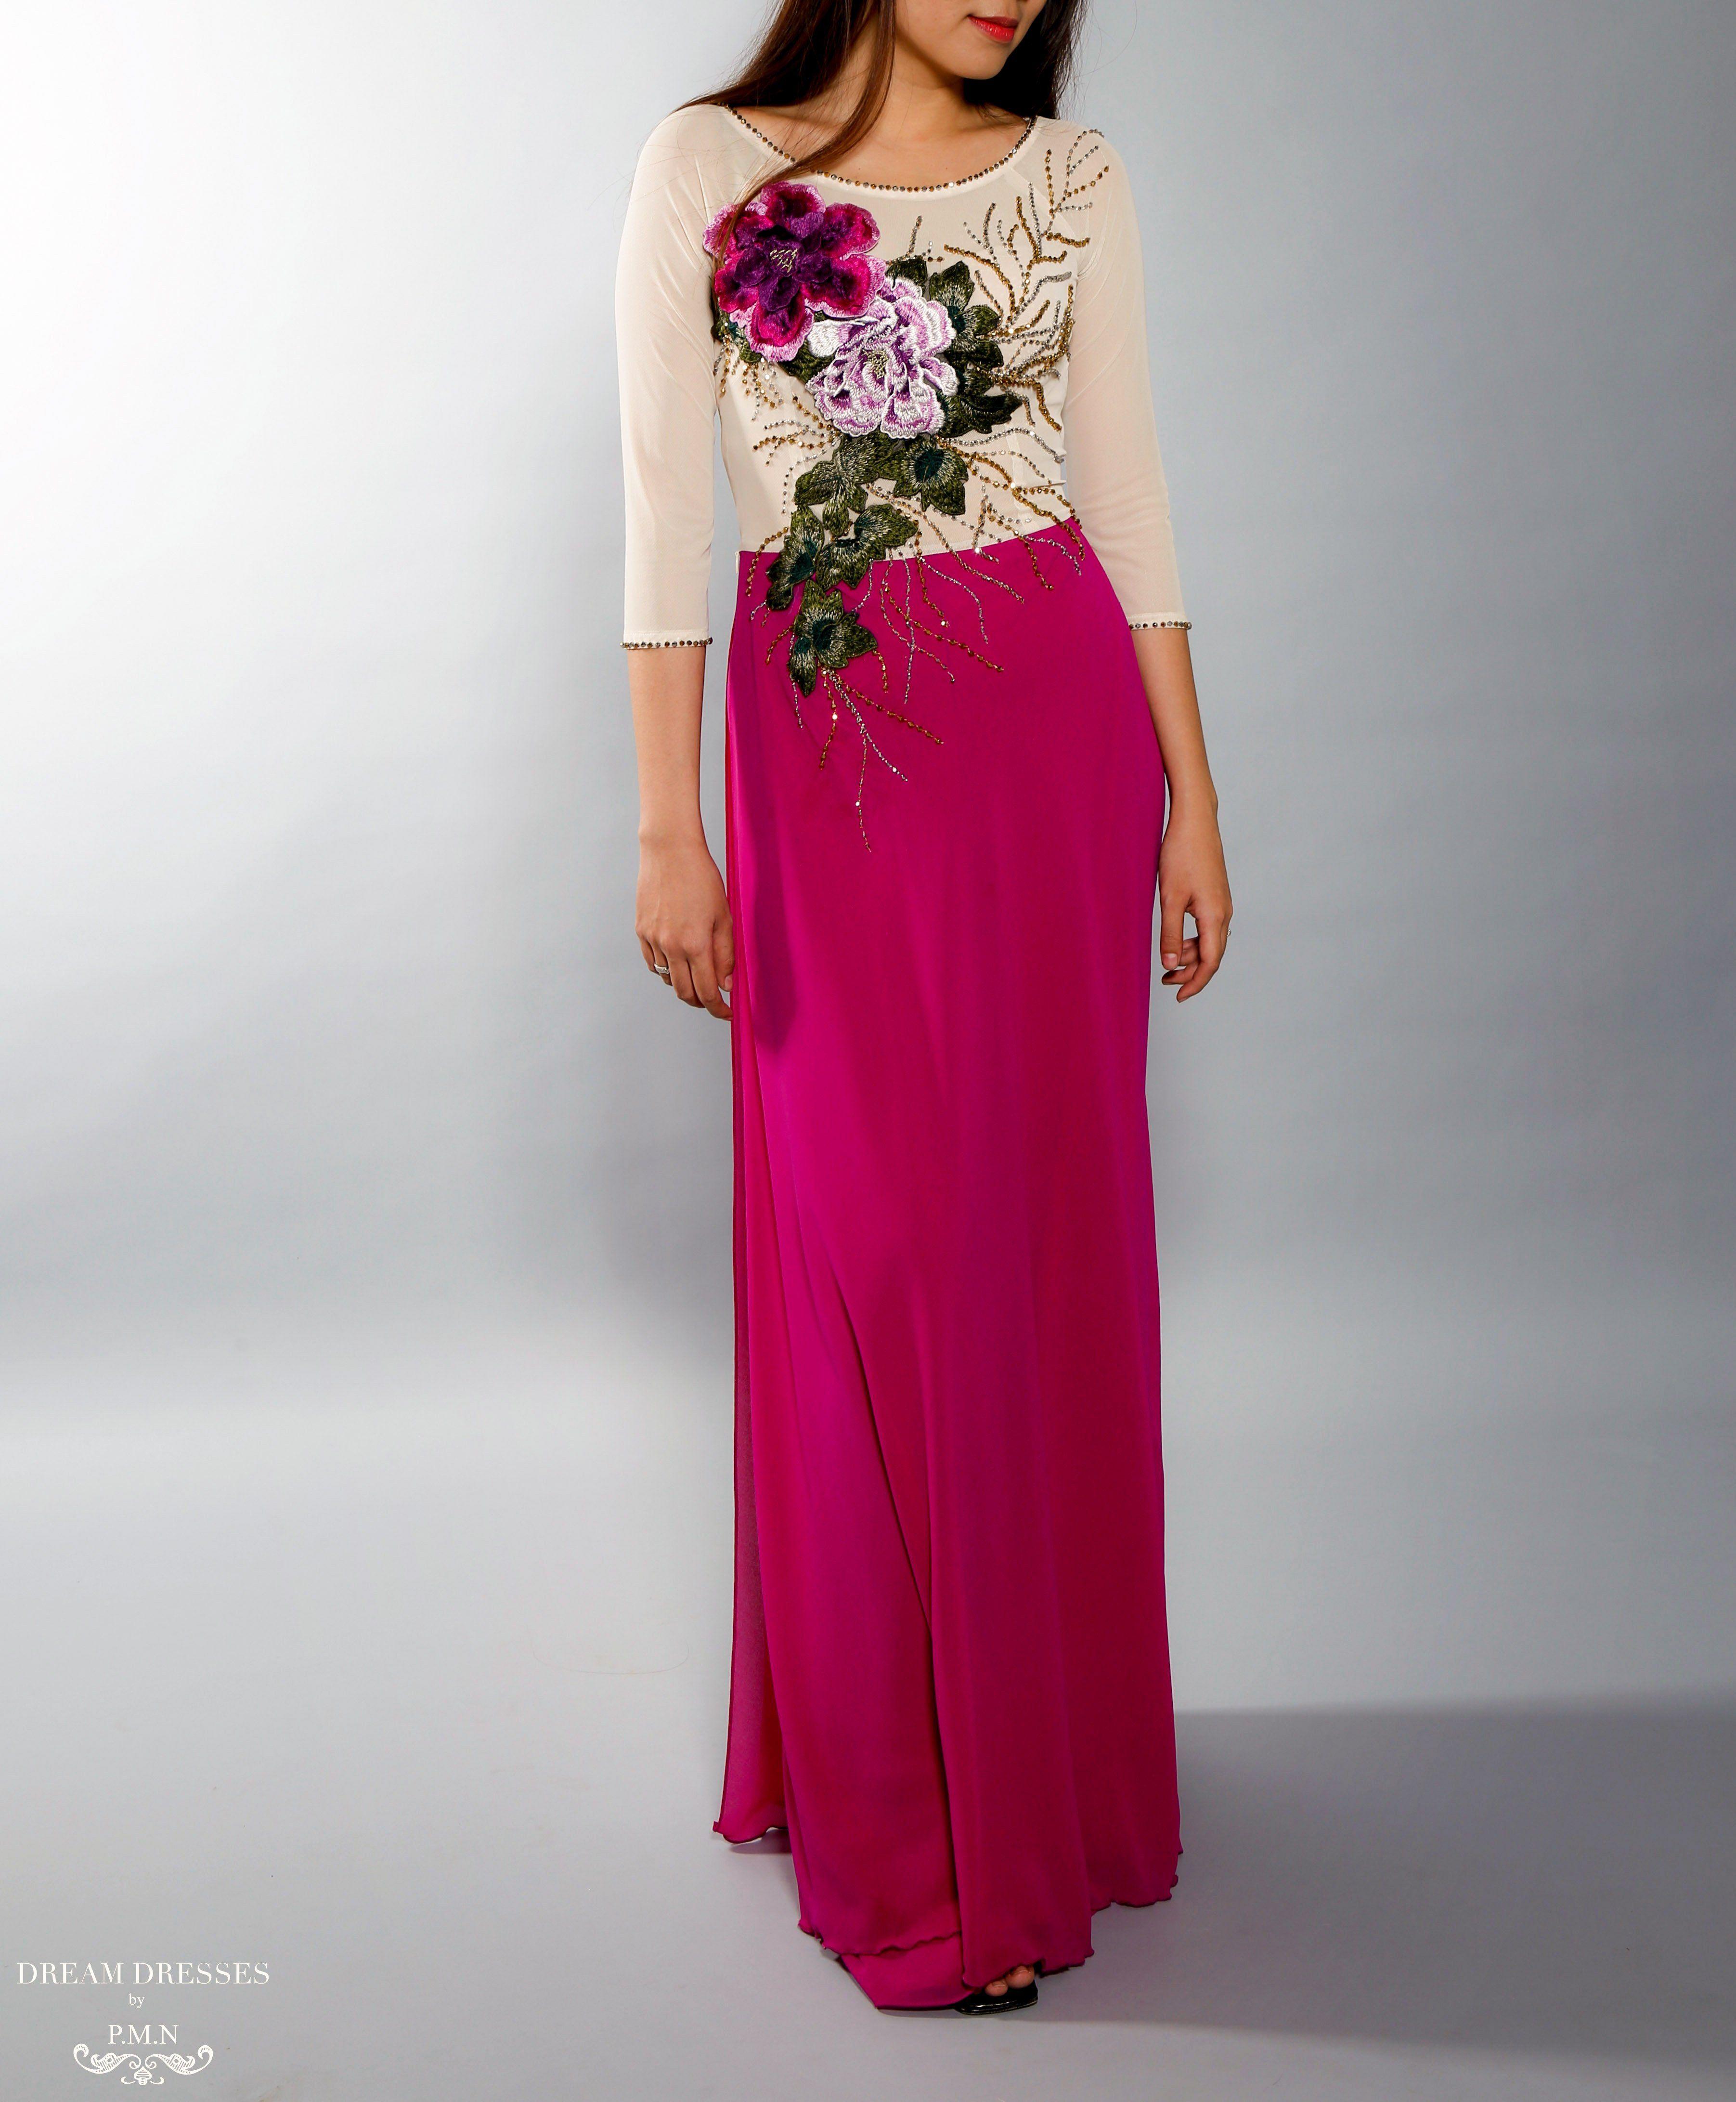 Color Block Modern Ao Dai Vietnamese Bridal Dress with